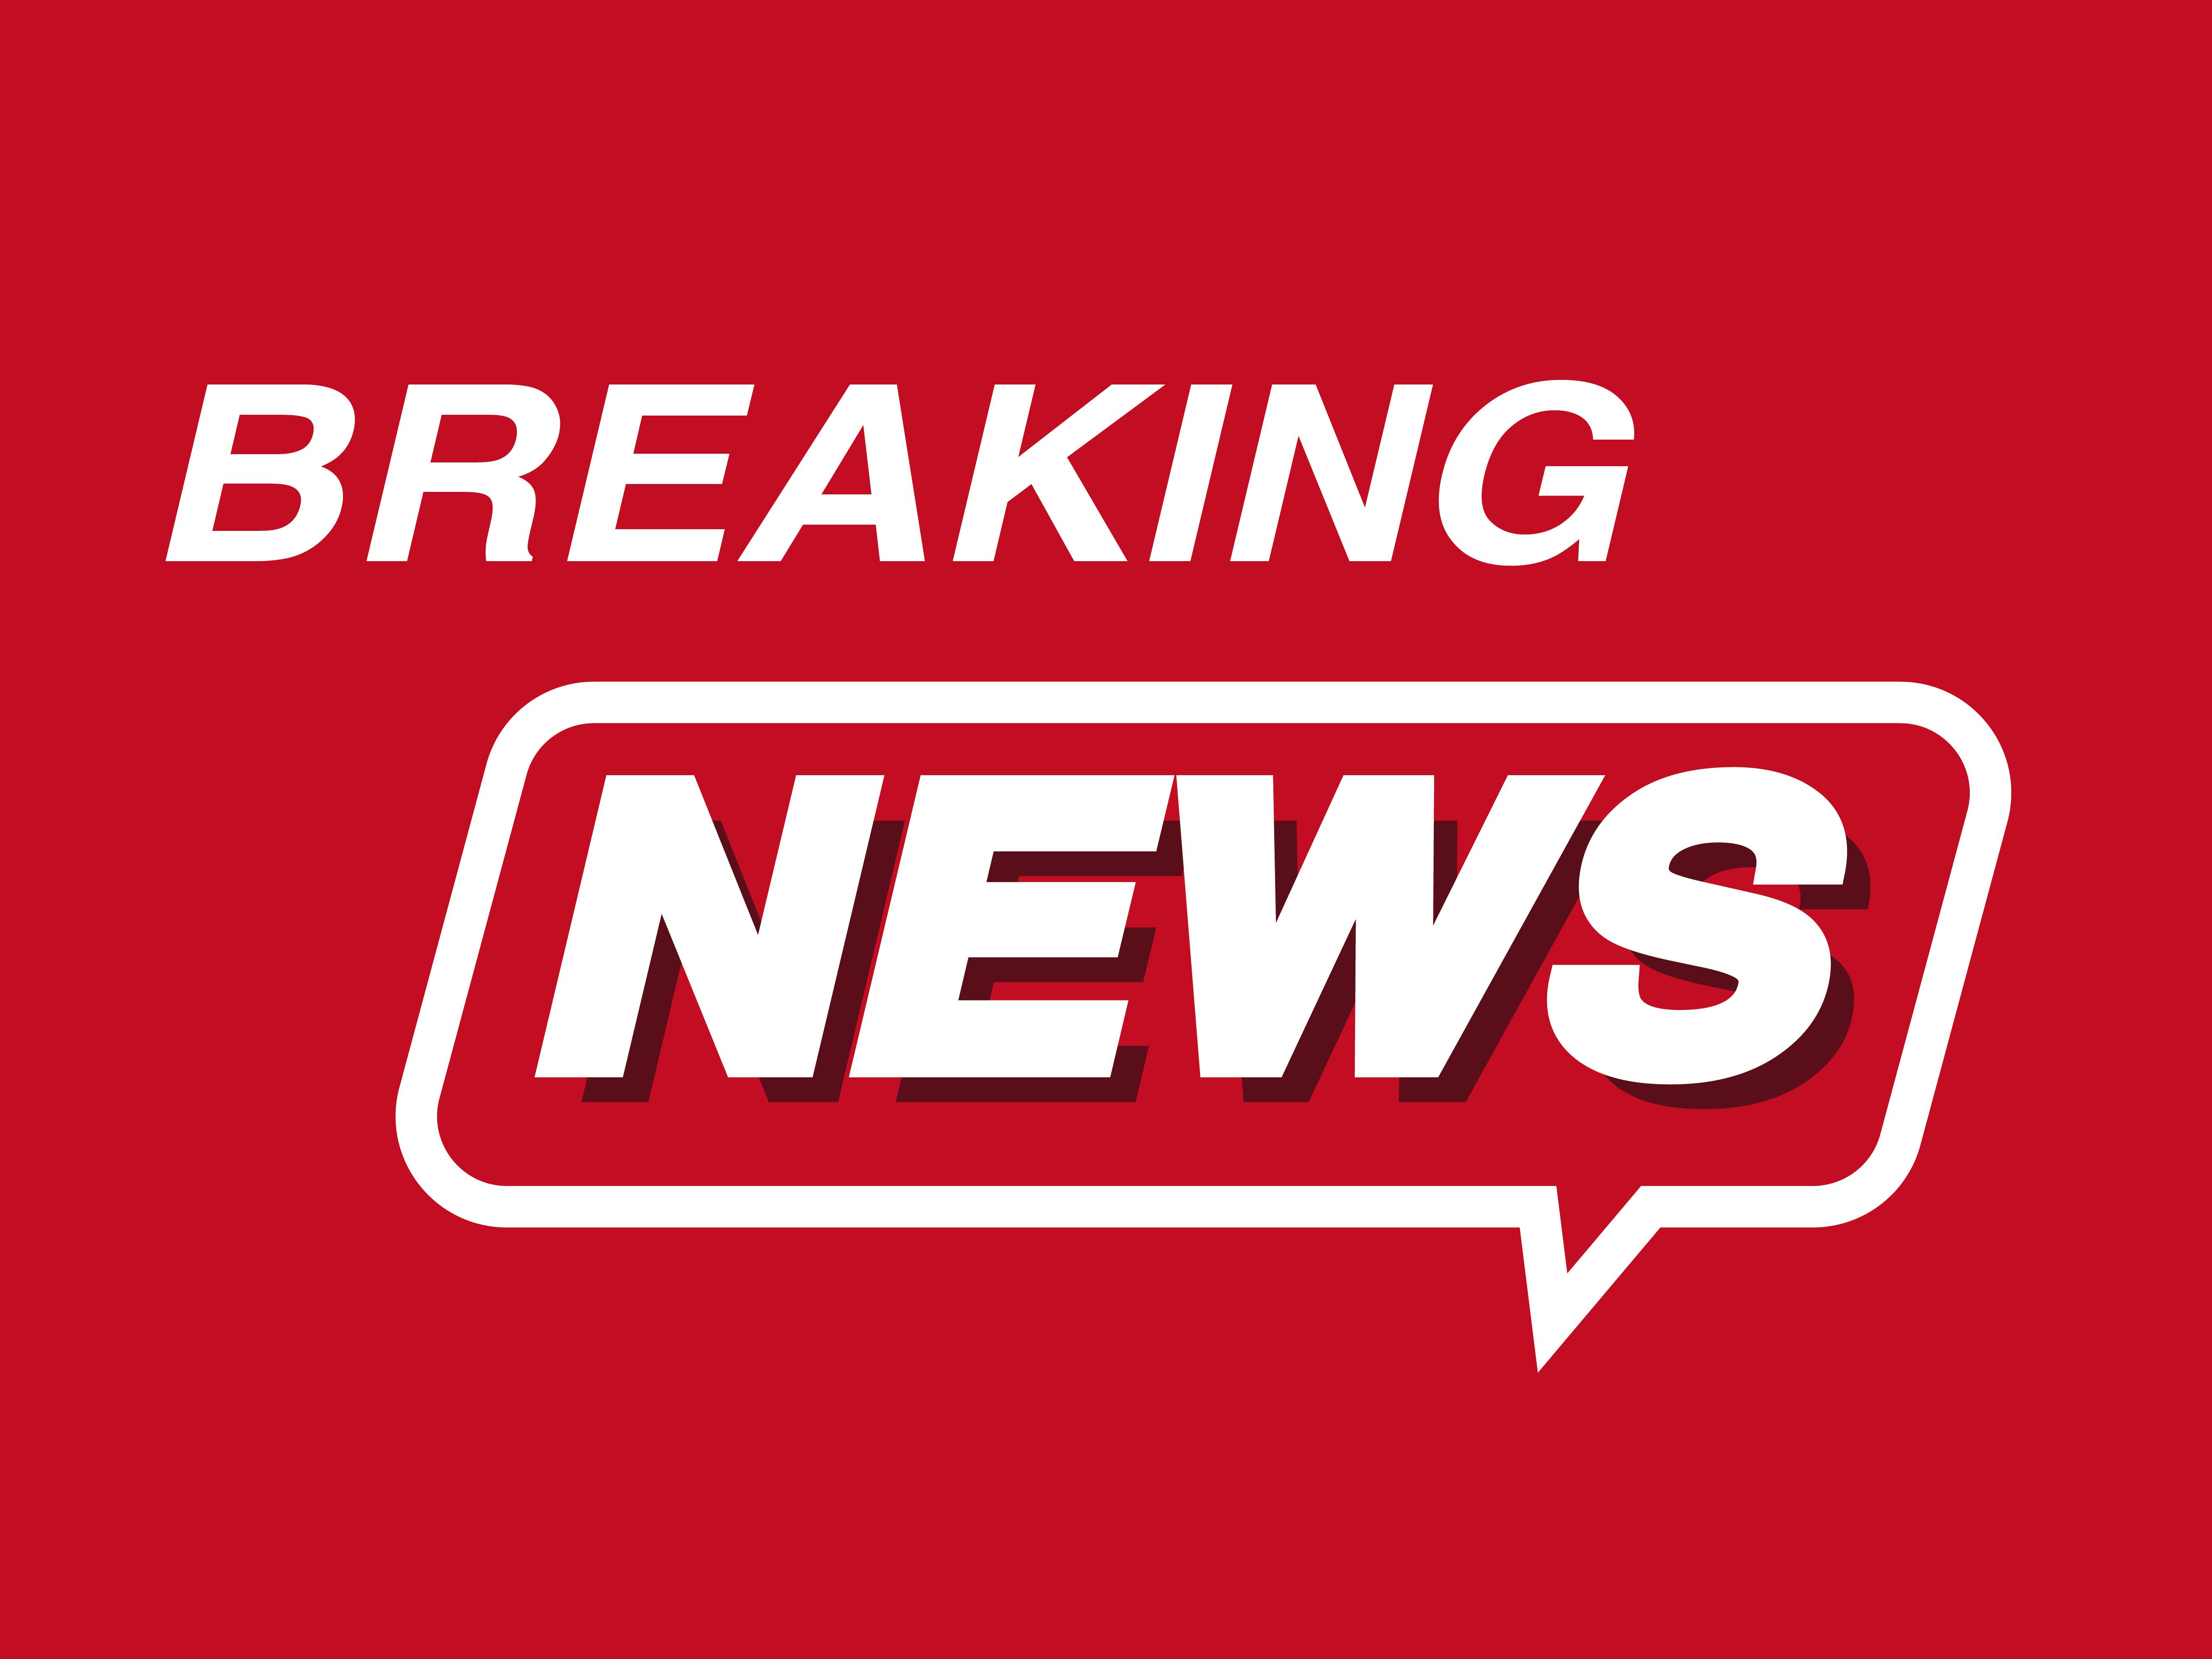 5.8-magnitude quake hits 49km W of Amatignak Island, Alaska: USGS